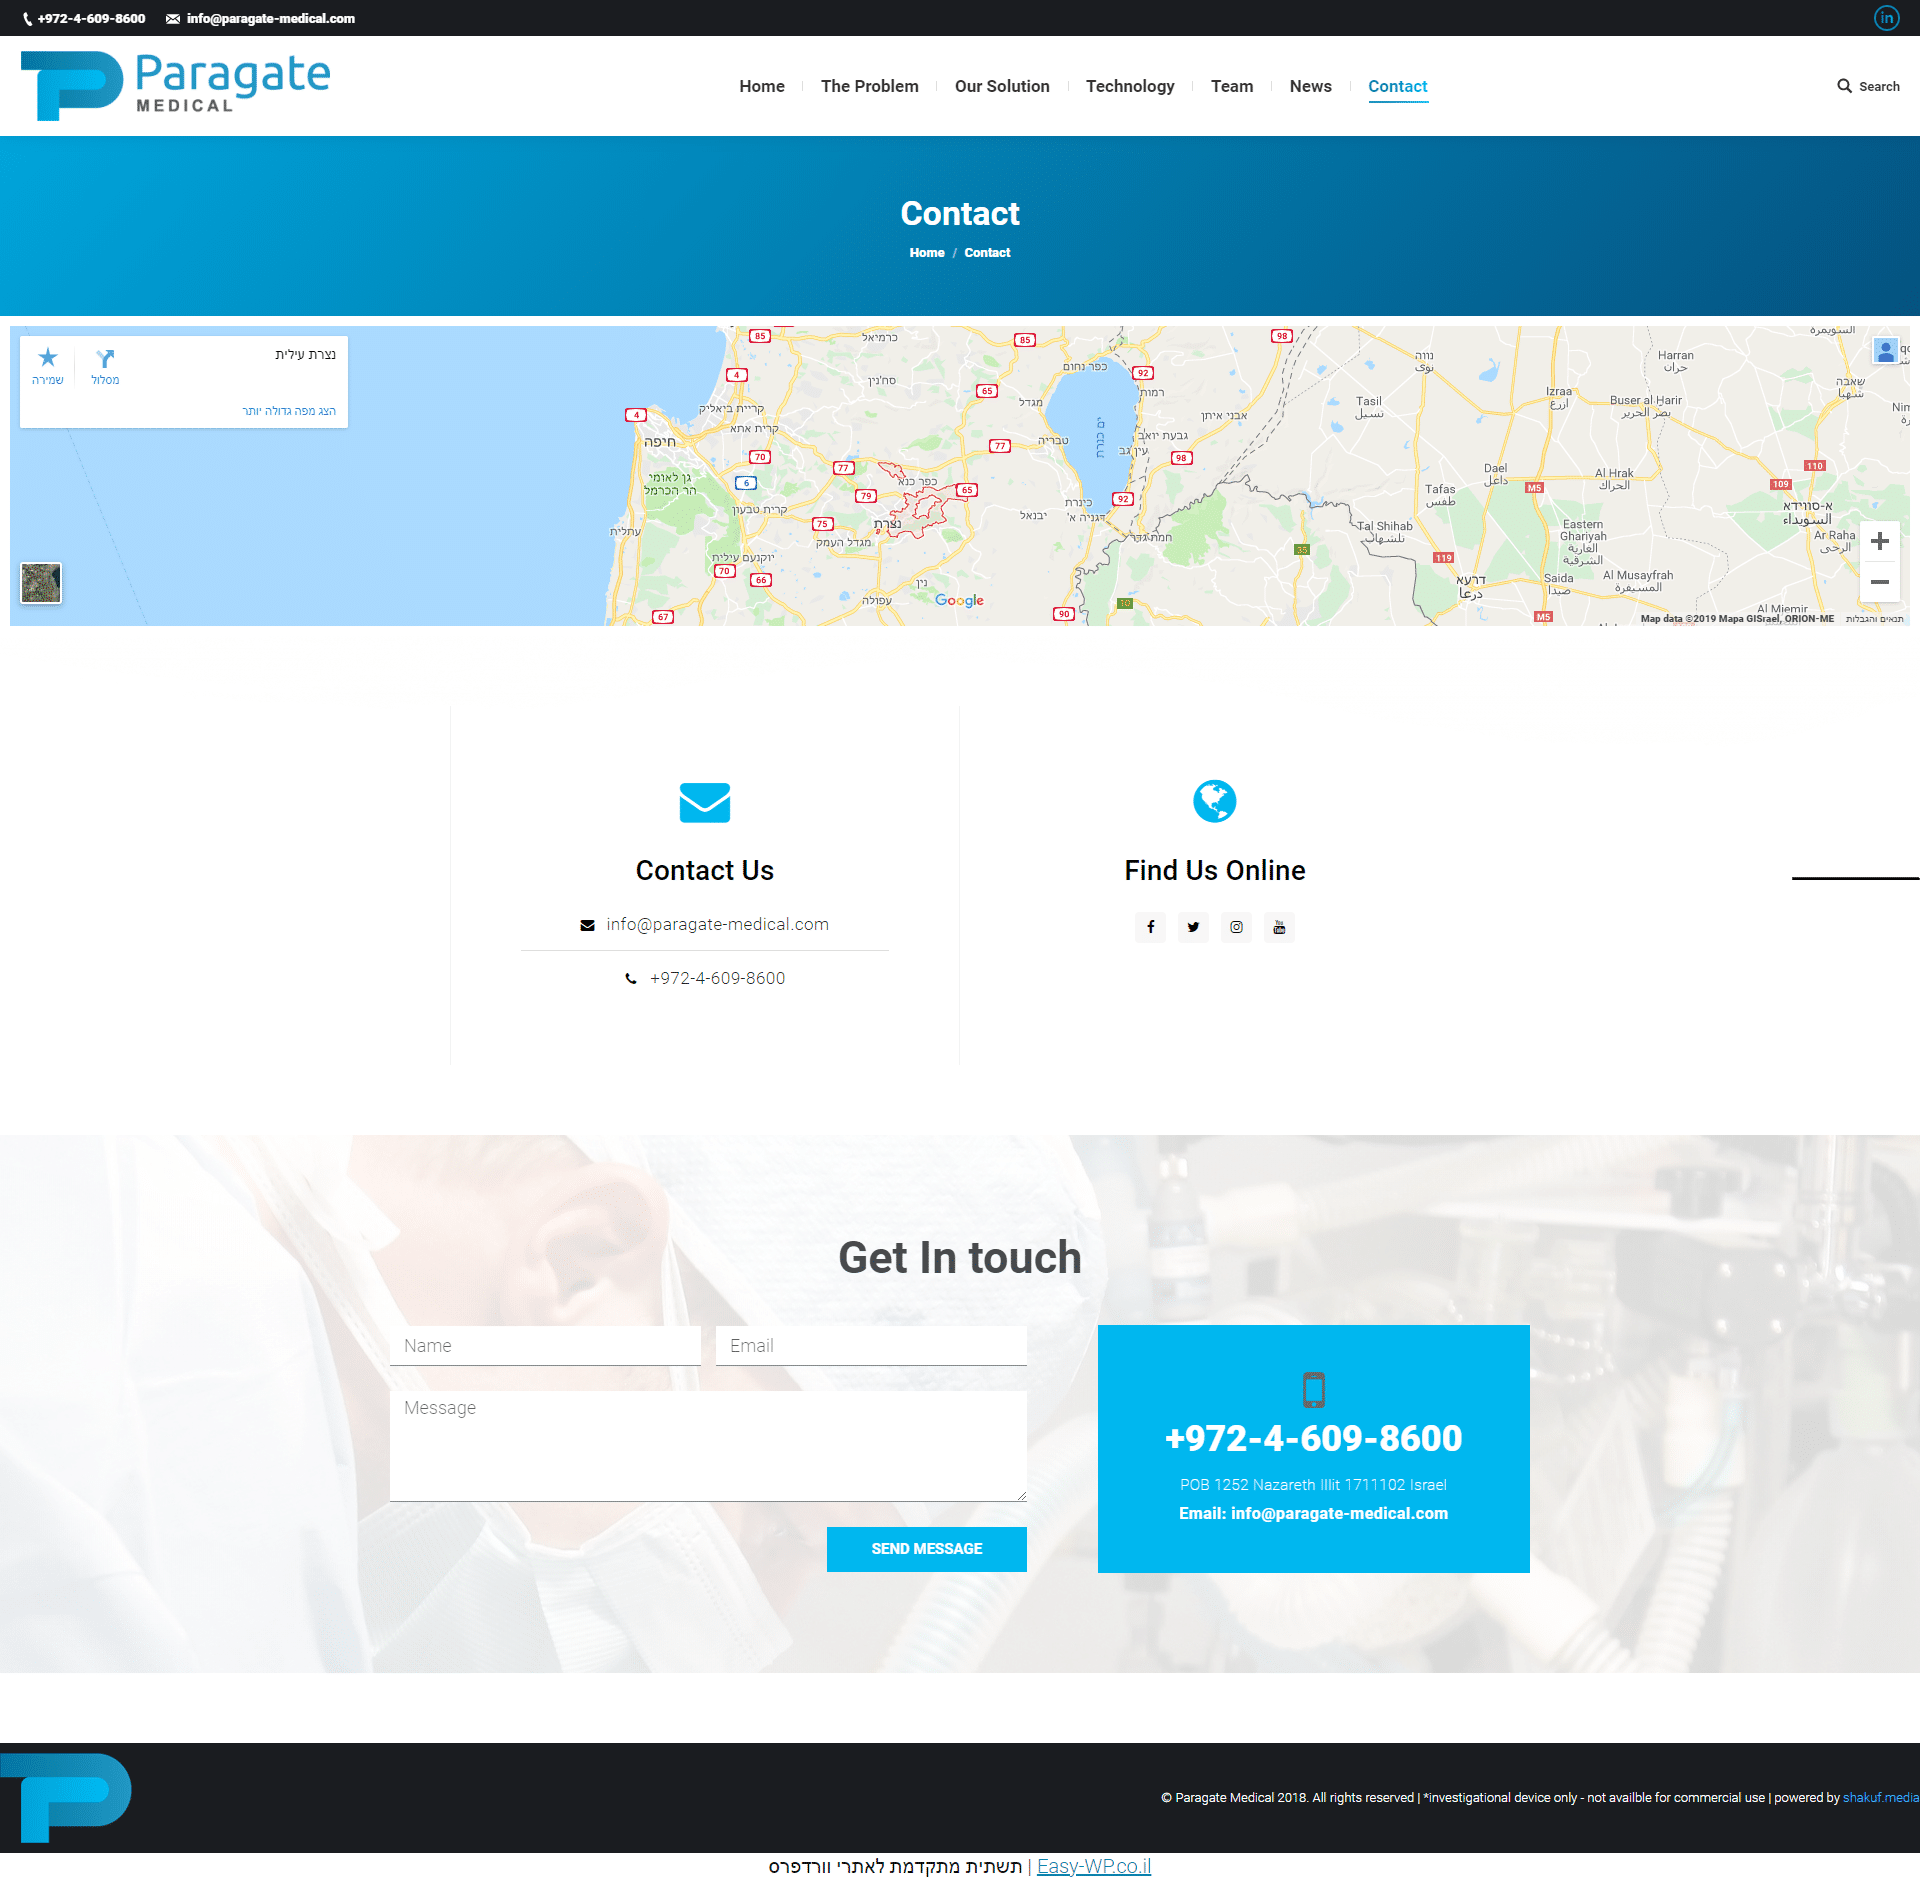 2paragate-medical.com